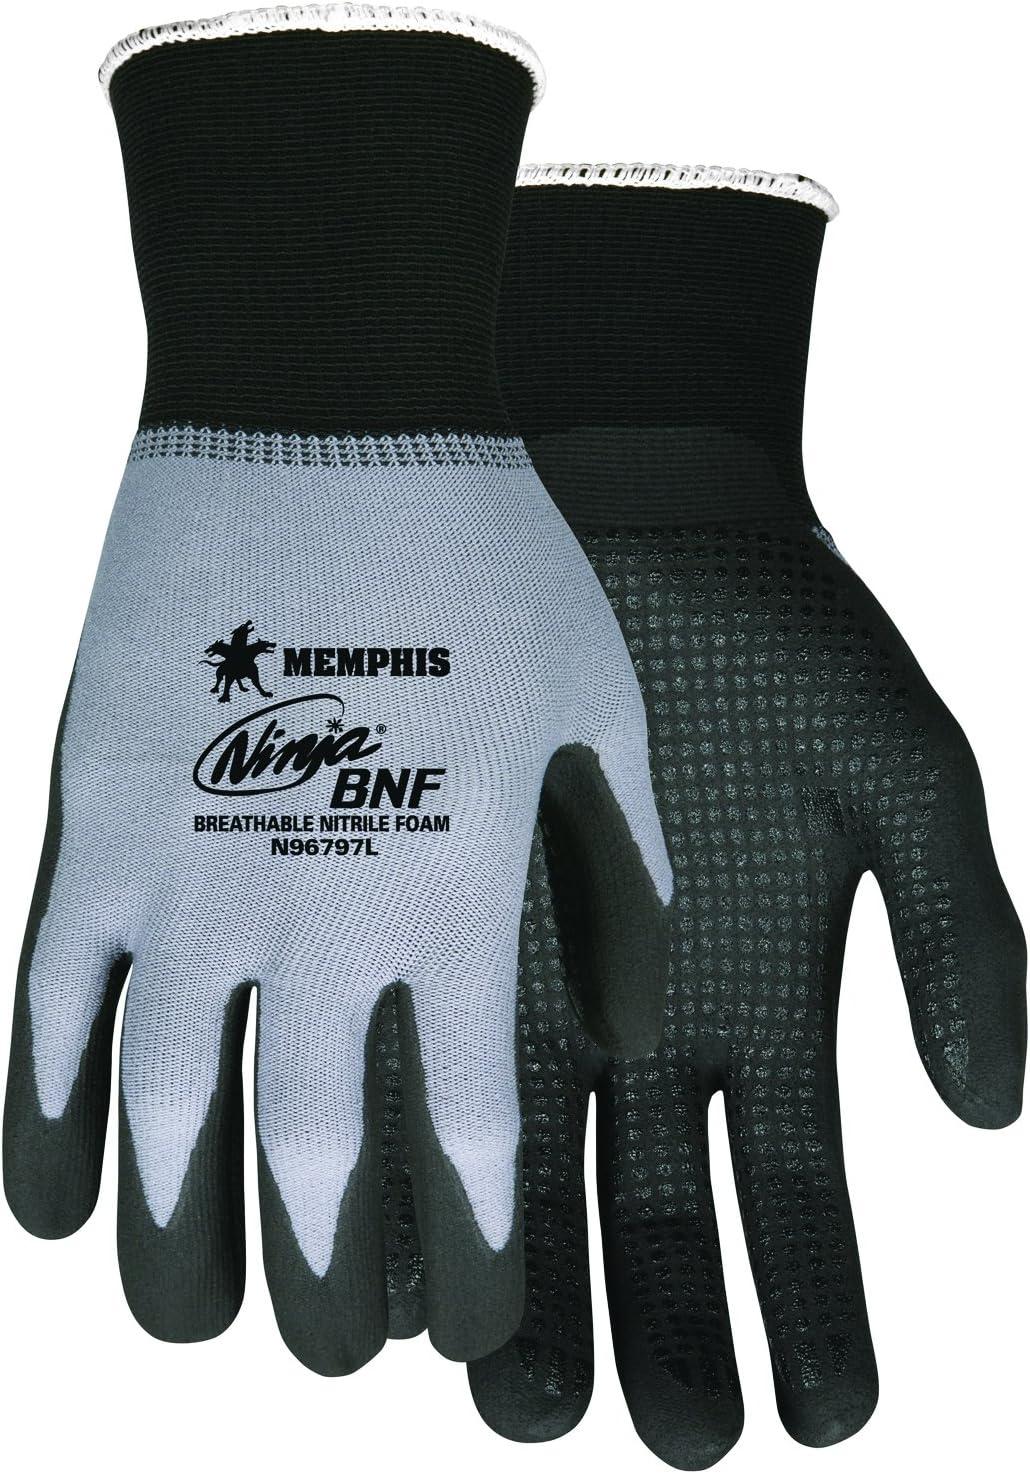 MCR Safety N96797M Ninja BNF Gloves, Medium, 1-Pair